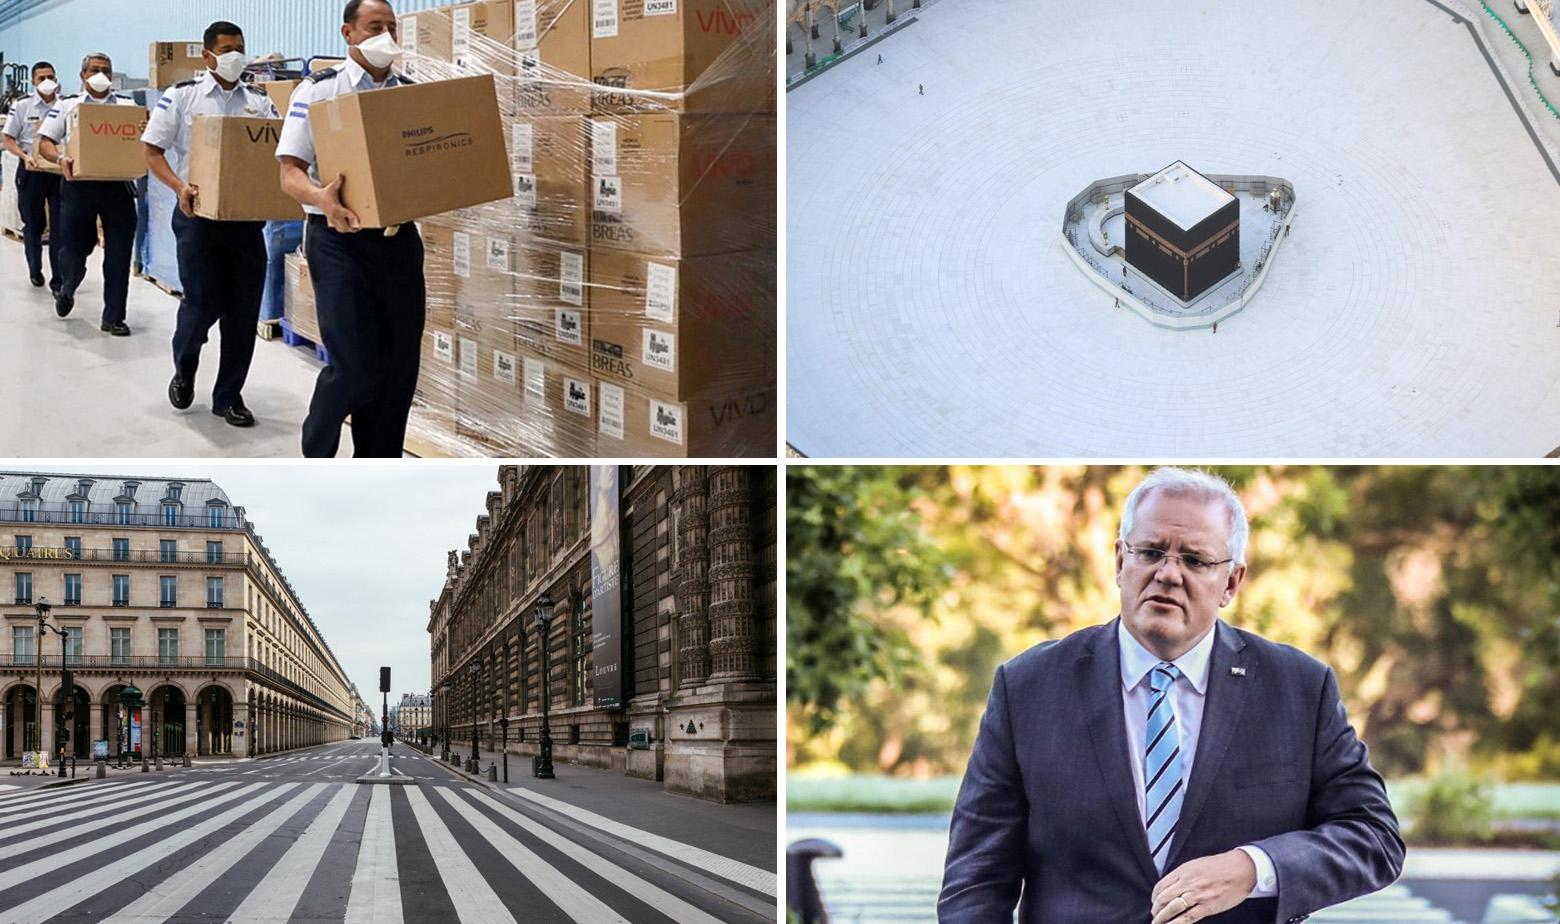 Prizori iz SAD-a, Meke, Pariza i australski premijer Scott Morrison